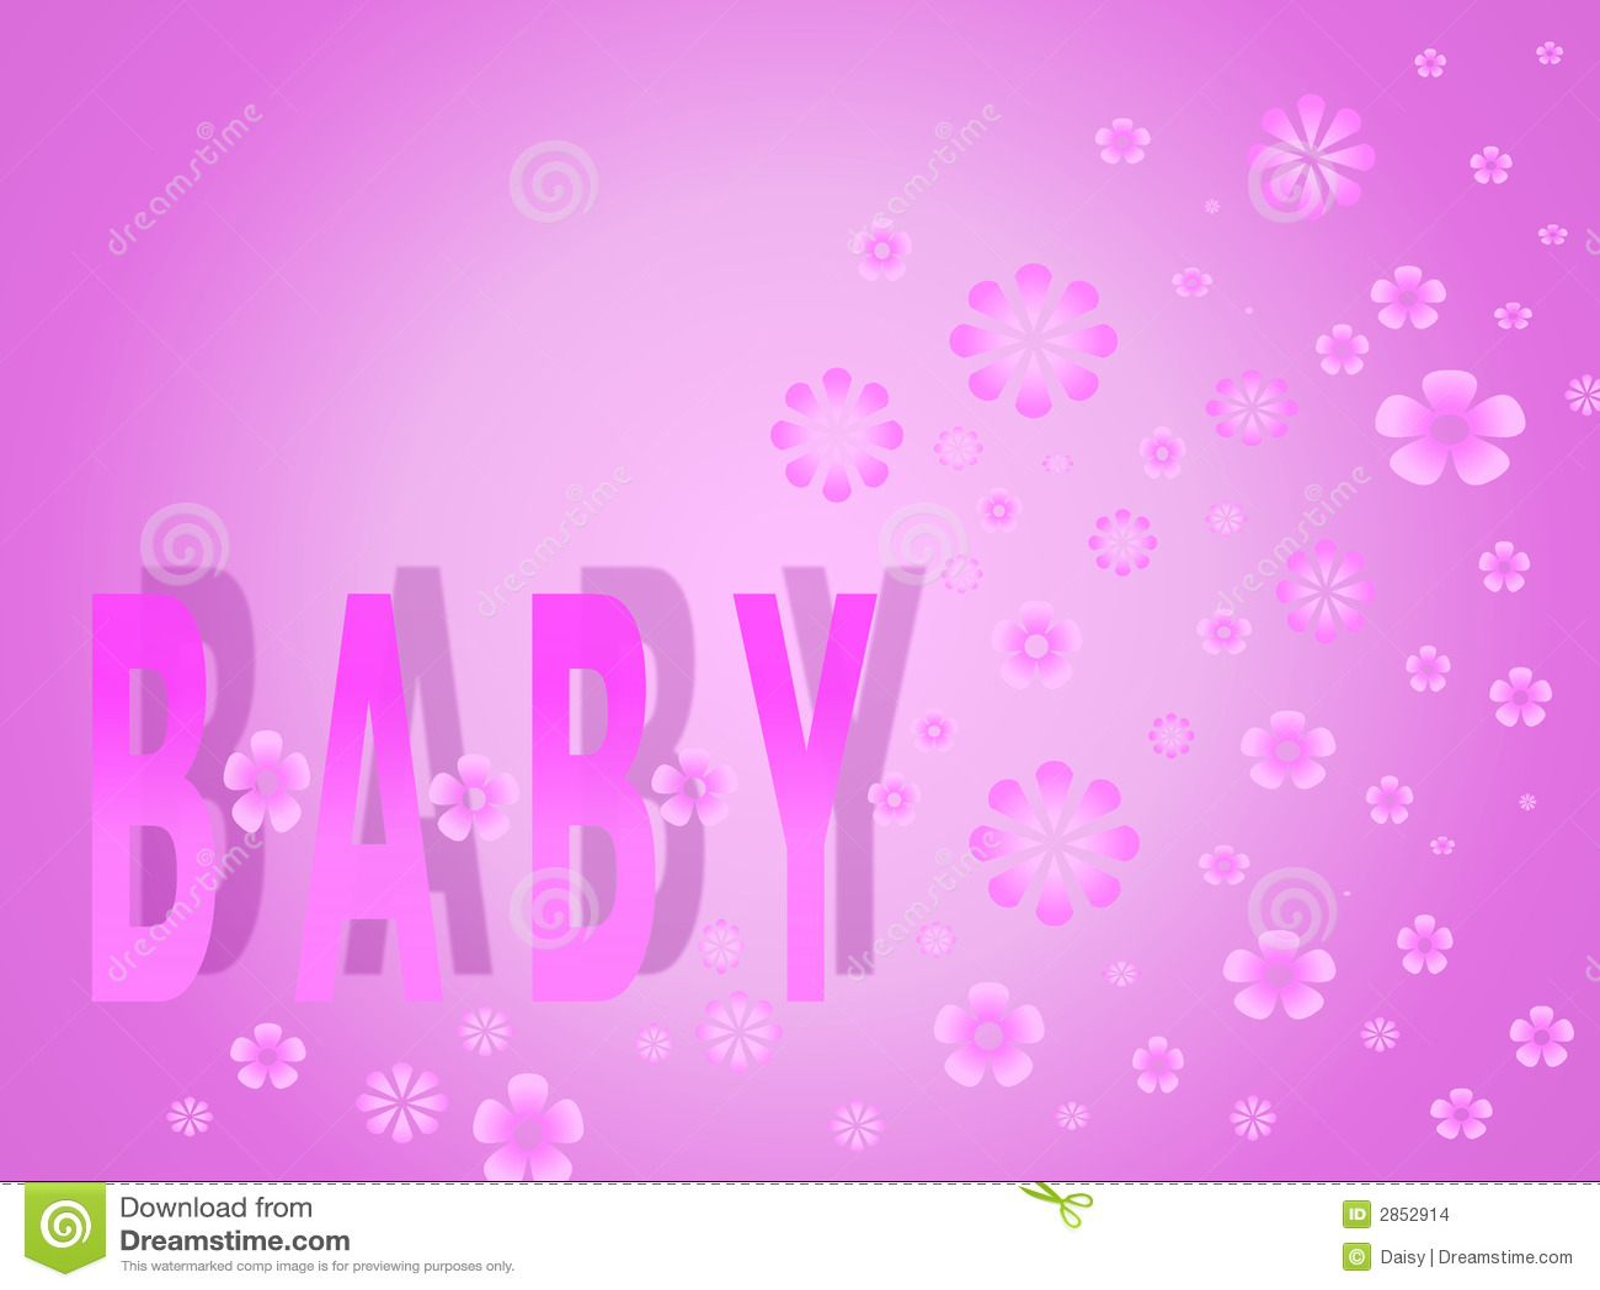 Girl Baby Shower Wallpaper Baby Girl Stock Images Image 2852914